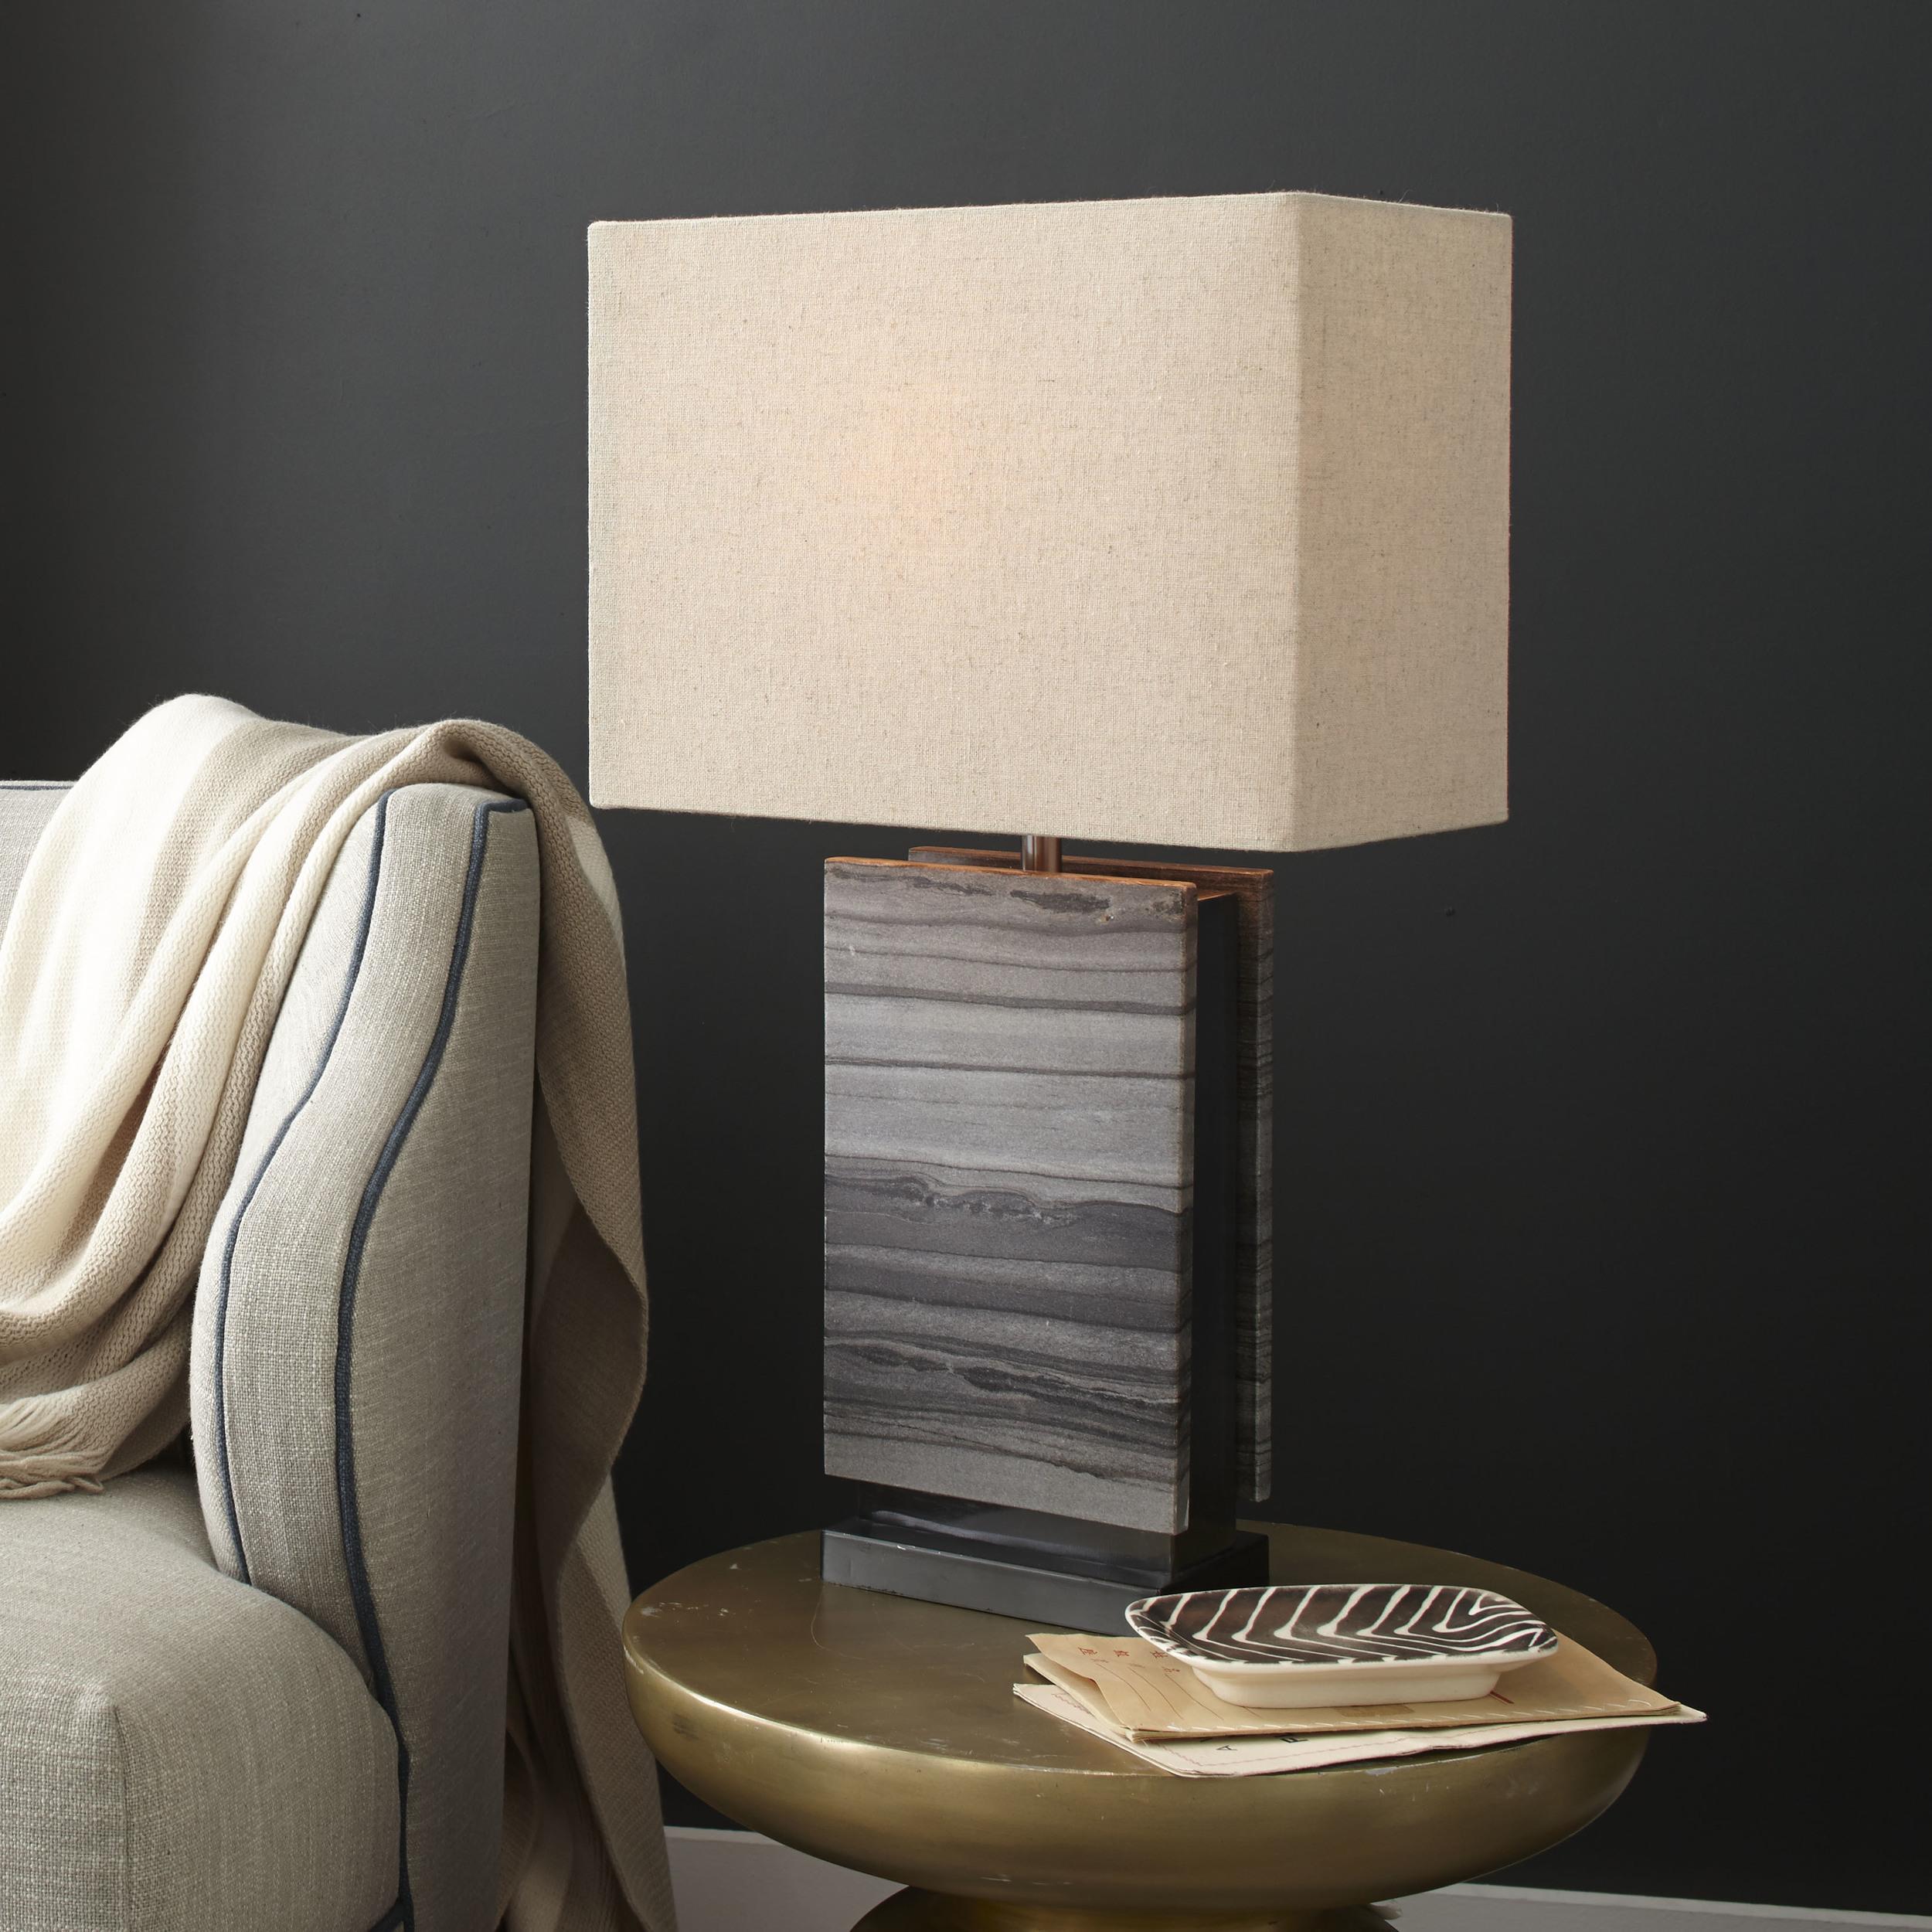 pip-monolith-stone-table-lamp-fa14-063.jpg